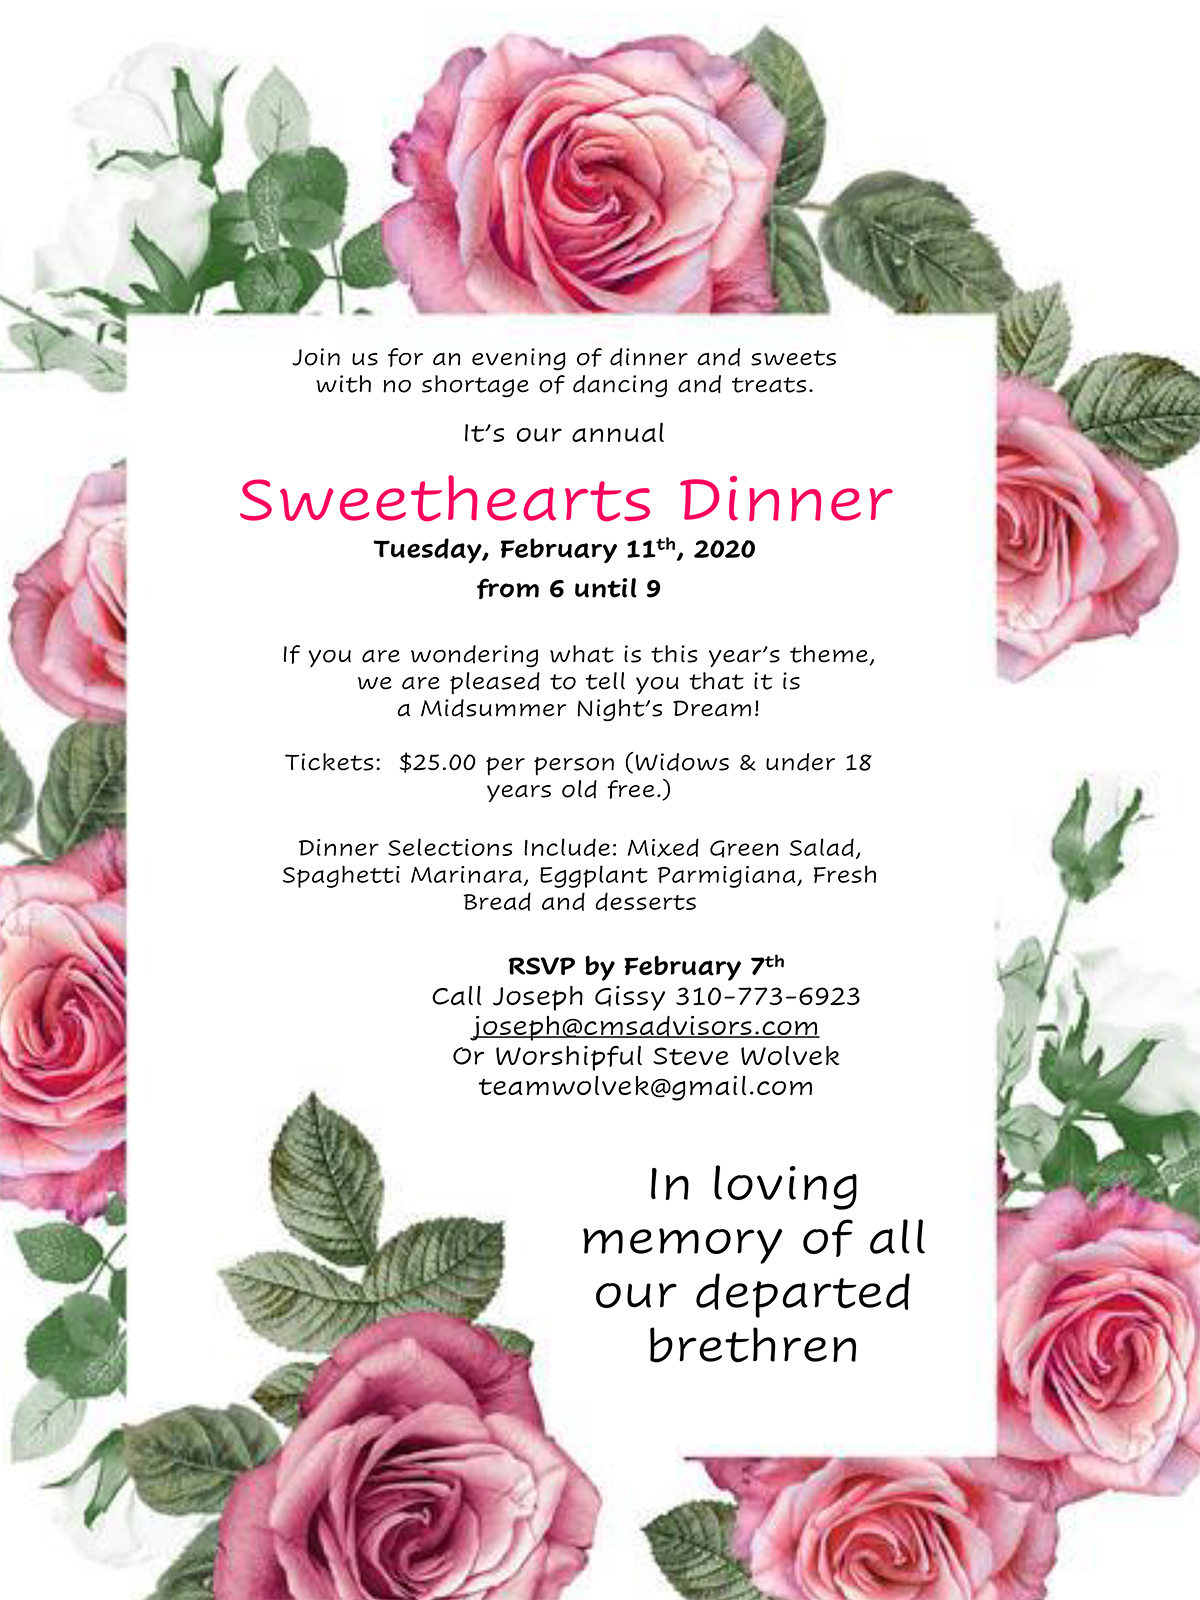 Sweethearts Dinner 2020